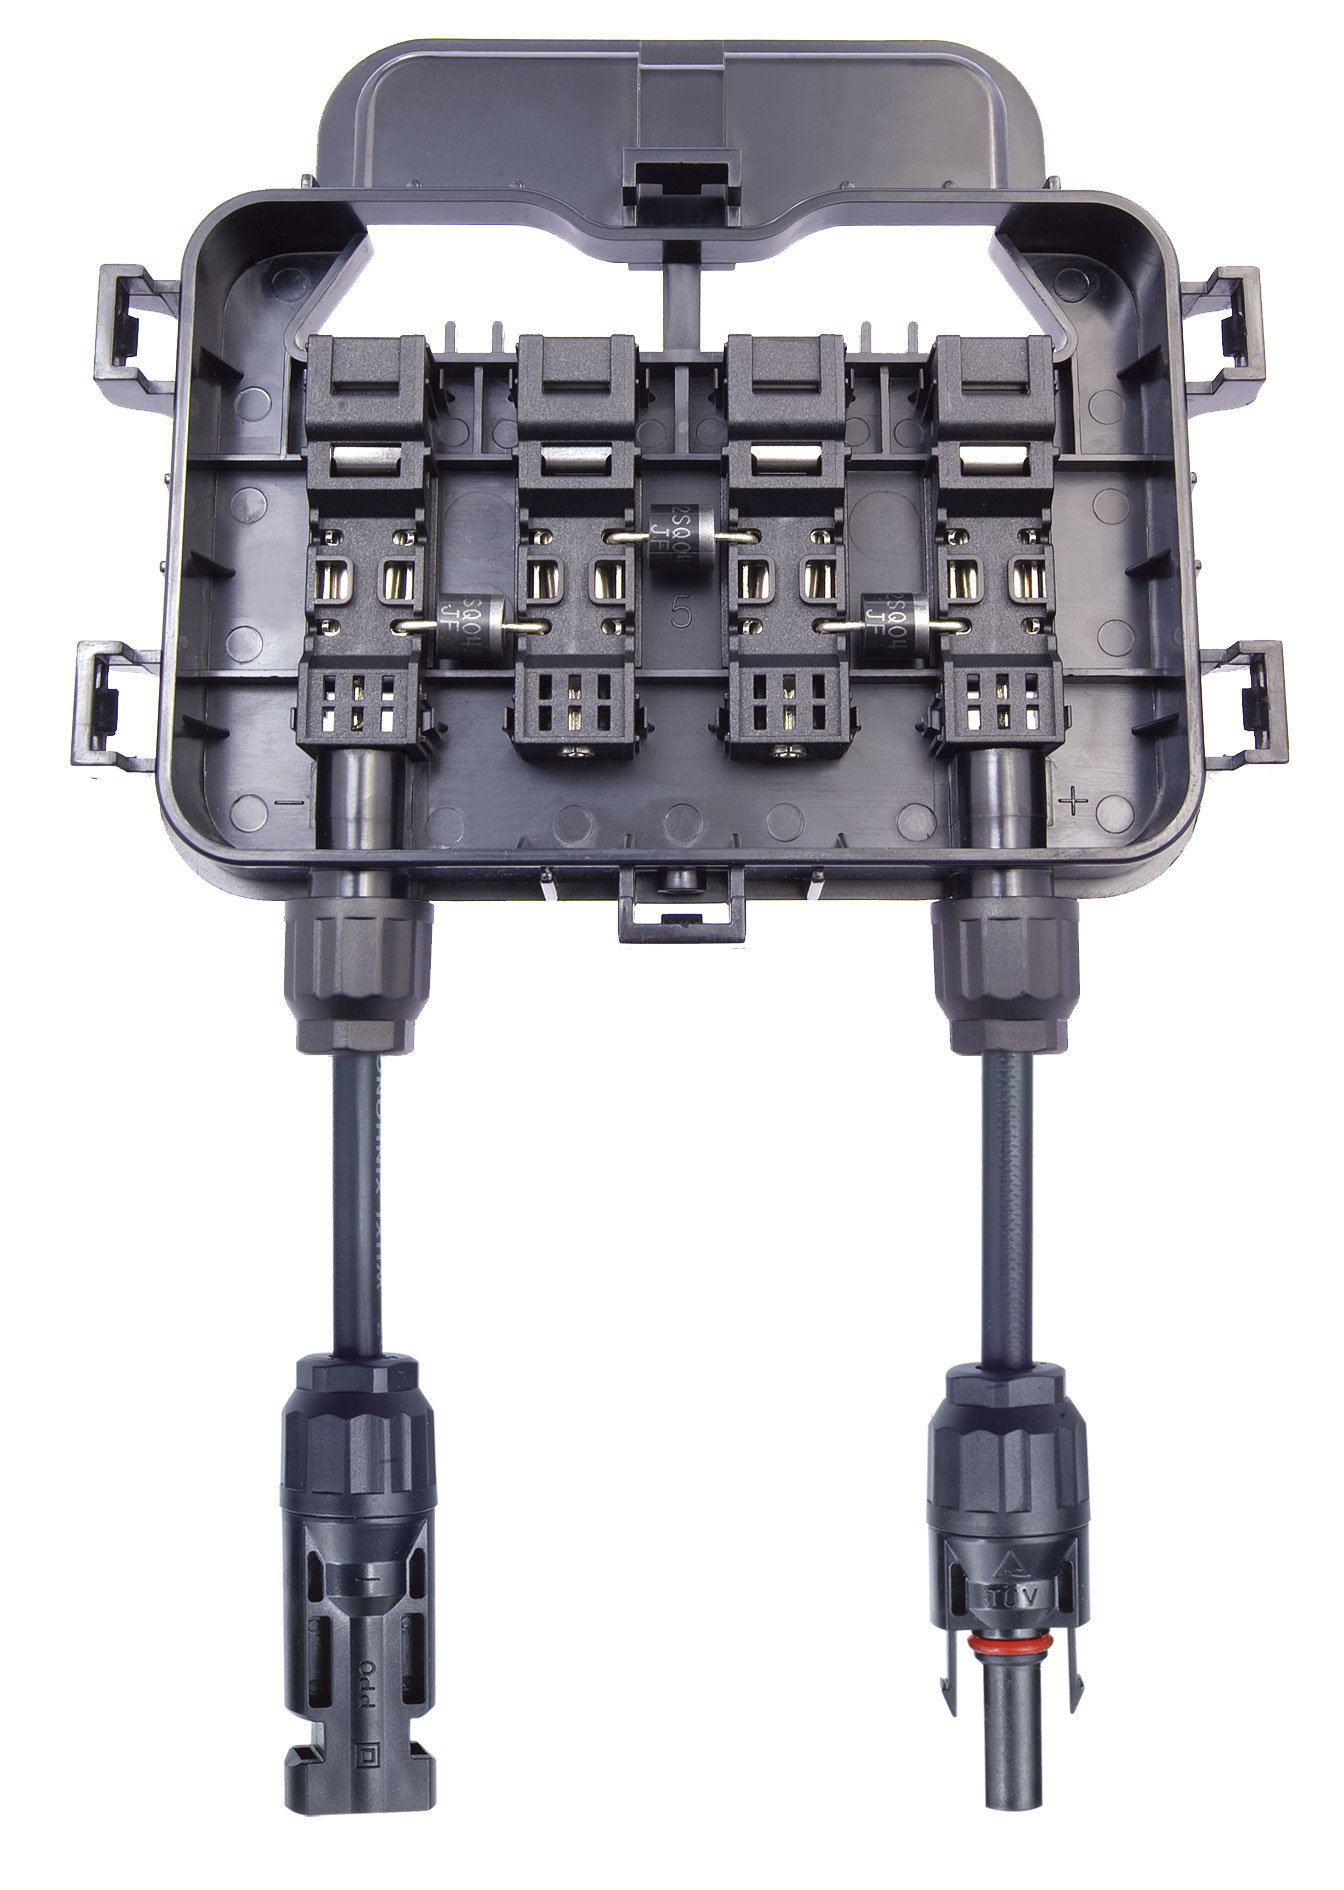 PV-Cy803 4 Rail PV Waterproof Small High Quality Junction Box